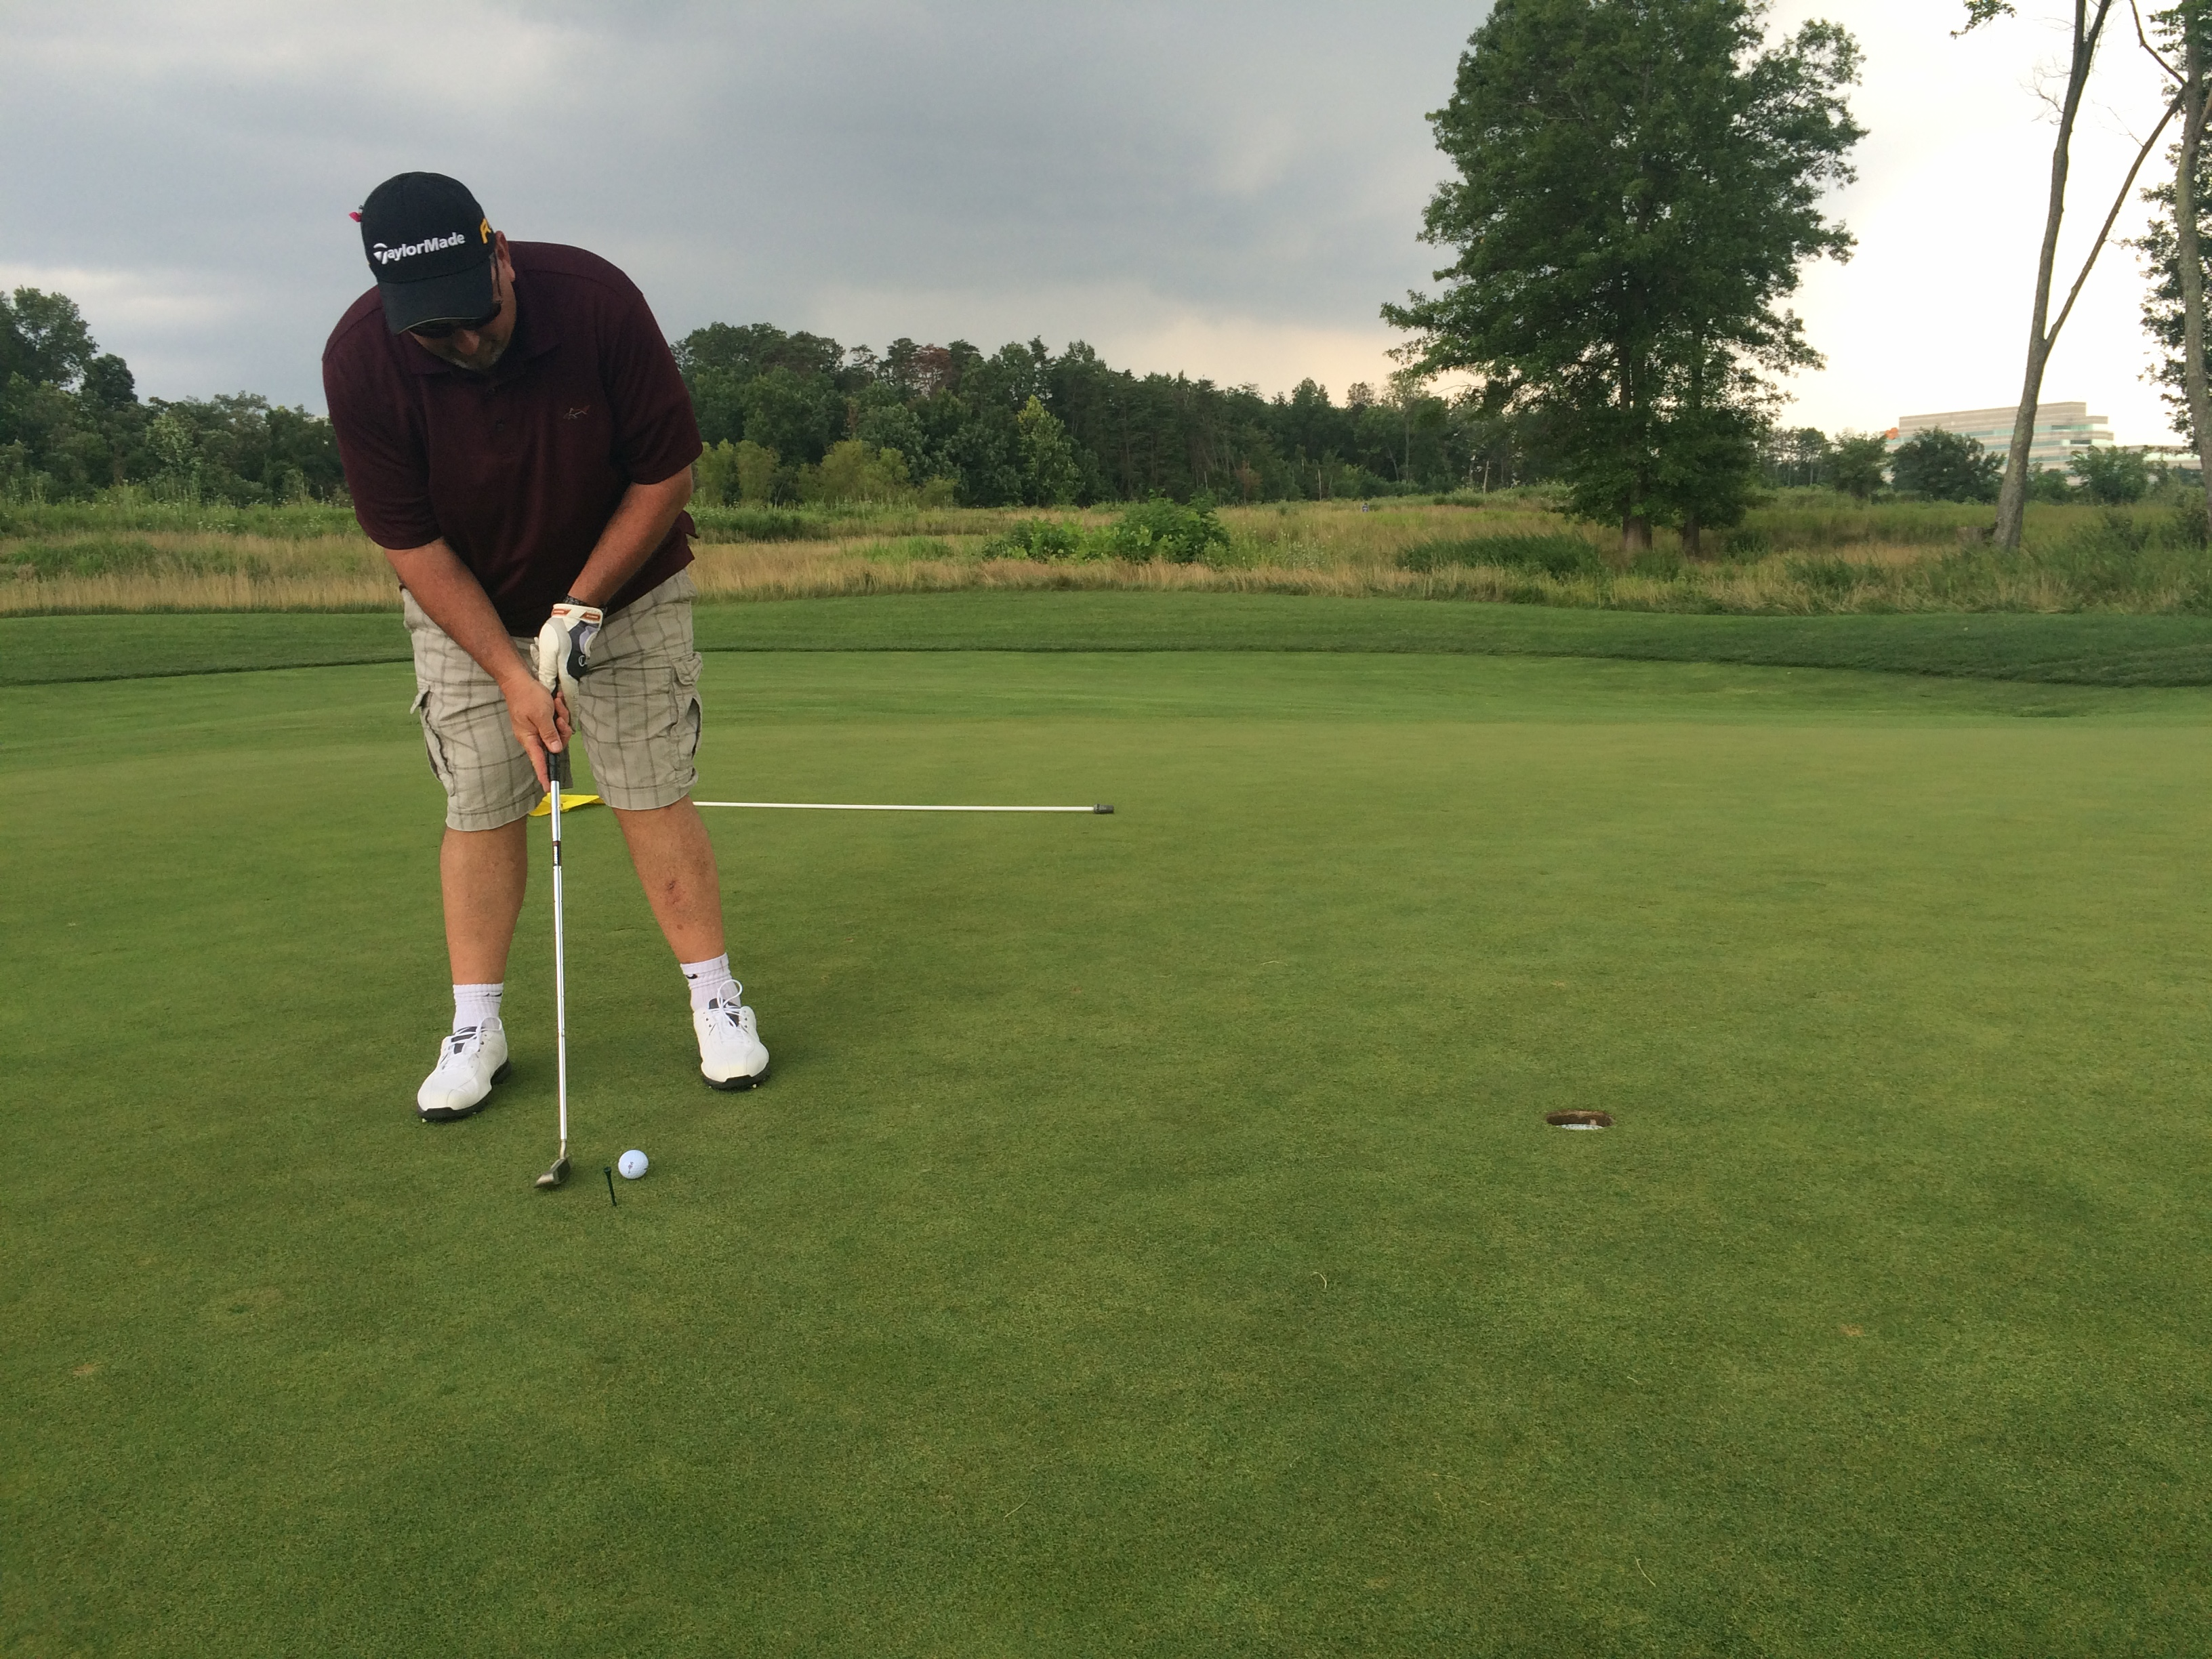 Ashburn teen remembered during Va. golf tourney